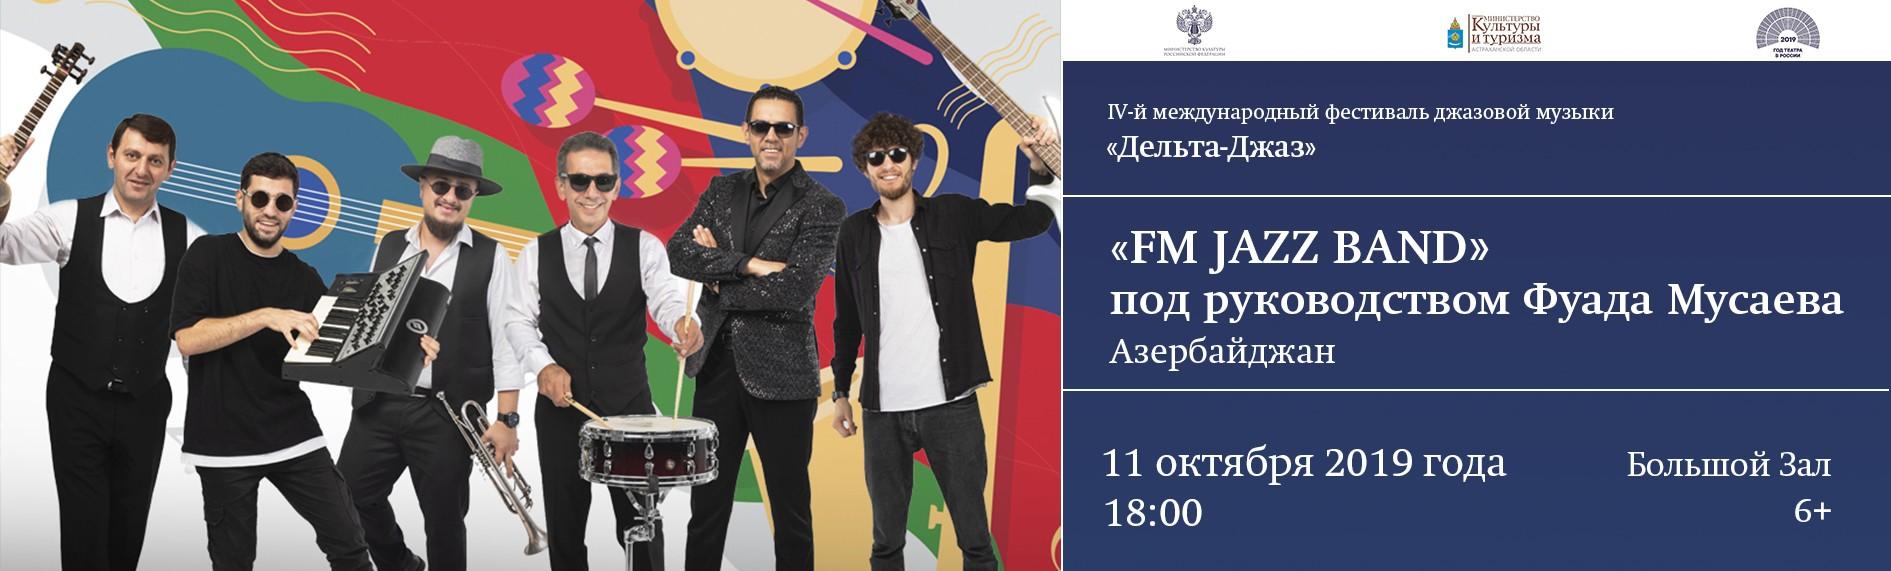 "Международный фестиваль ""Дельта Джаз"".FM JAZZ BAND"" Азербайджан"